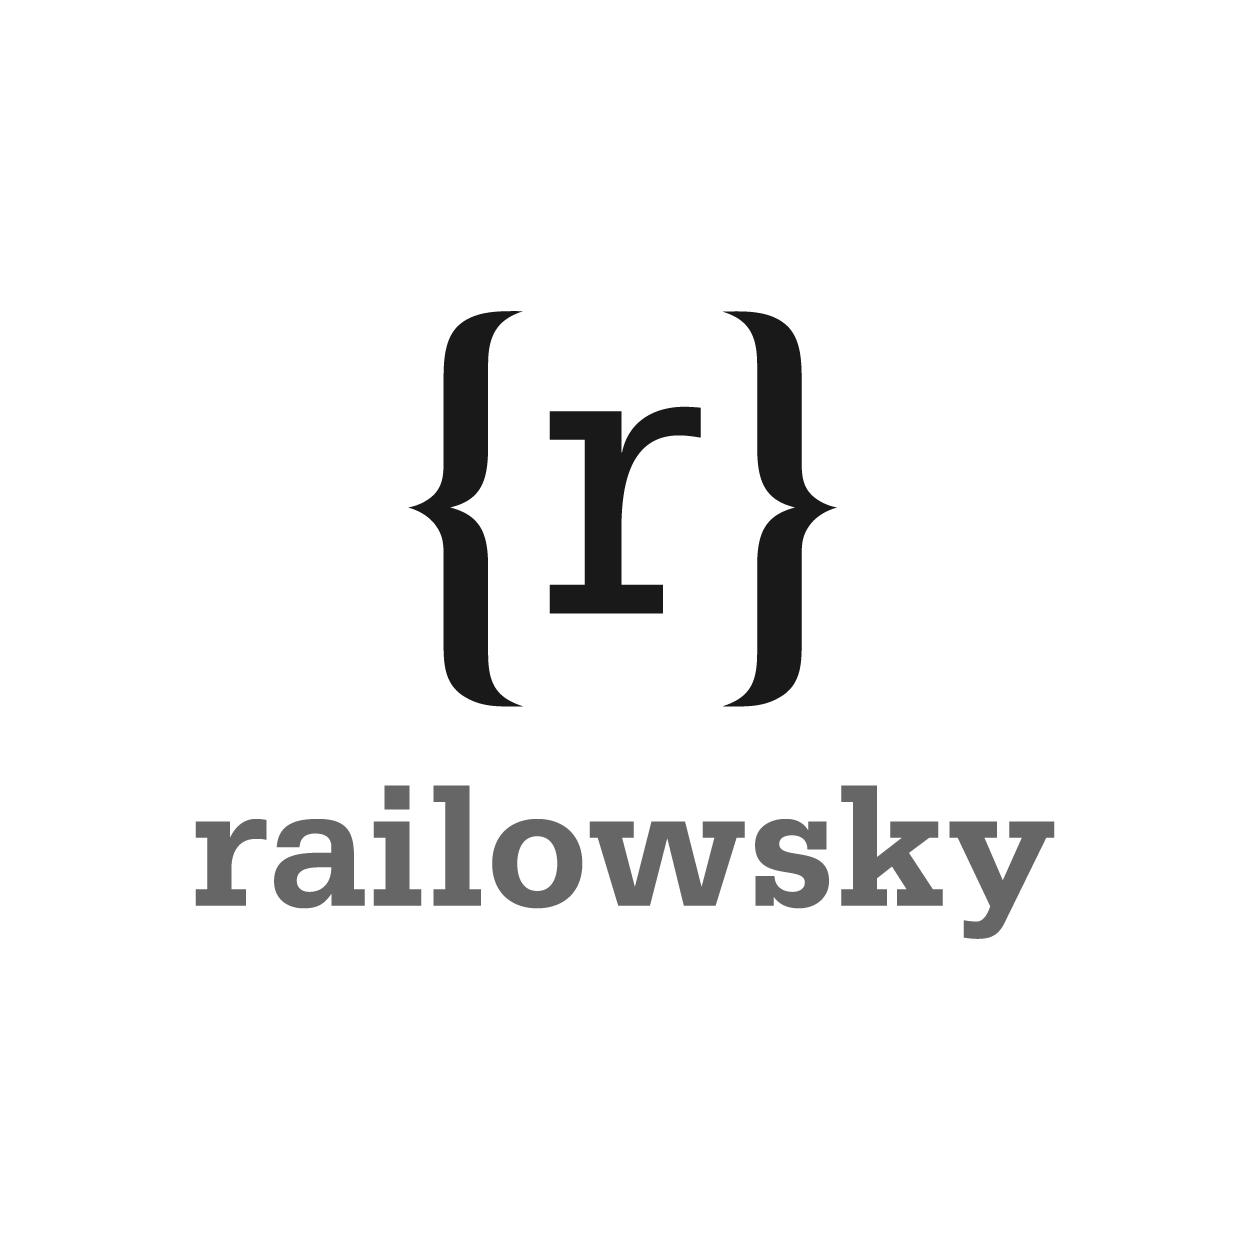 railowsky_victorgc.png